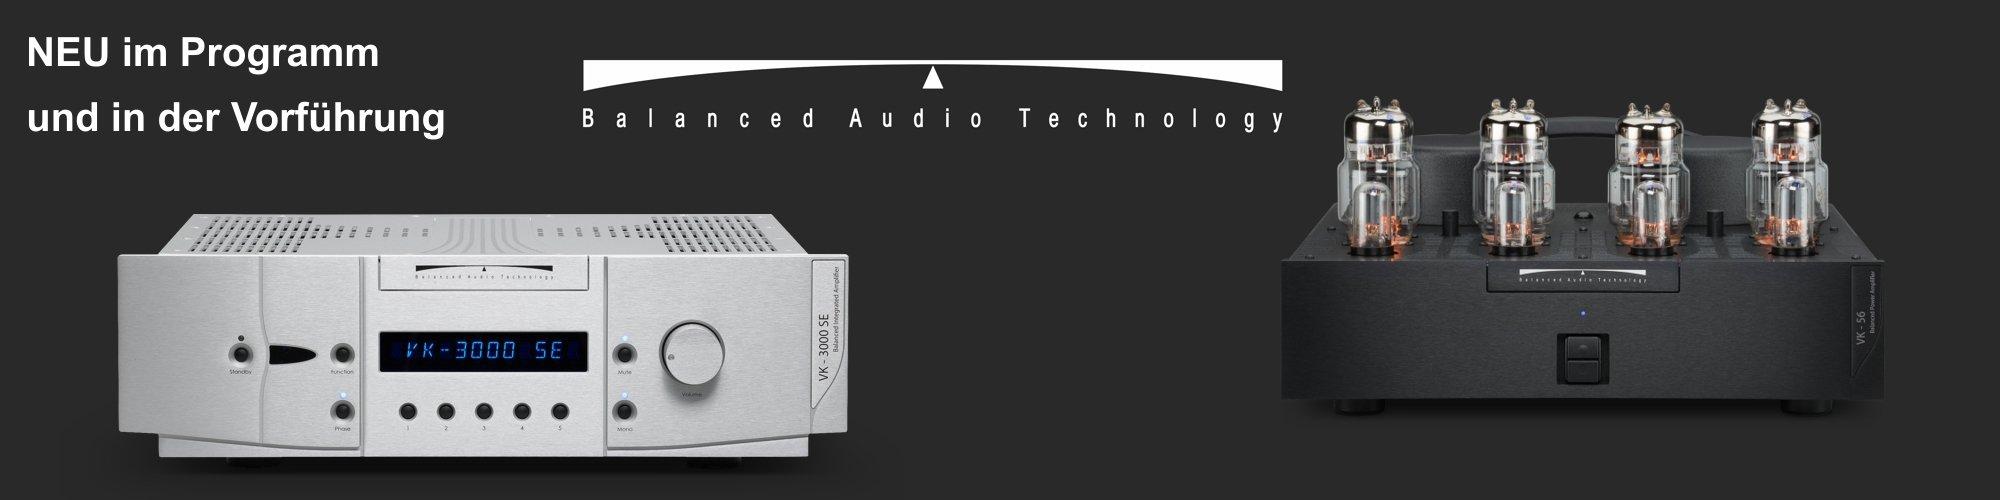 BAT - Balanced Audio Technology